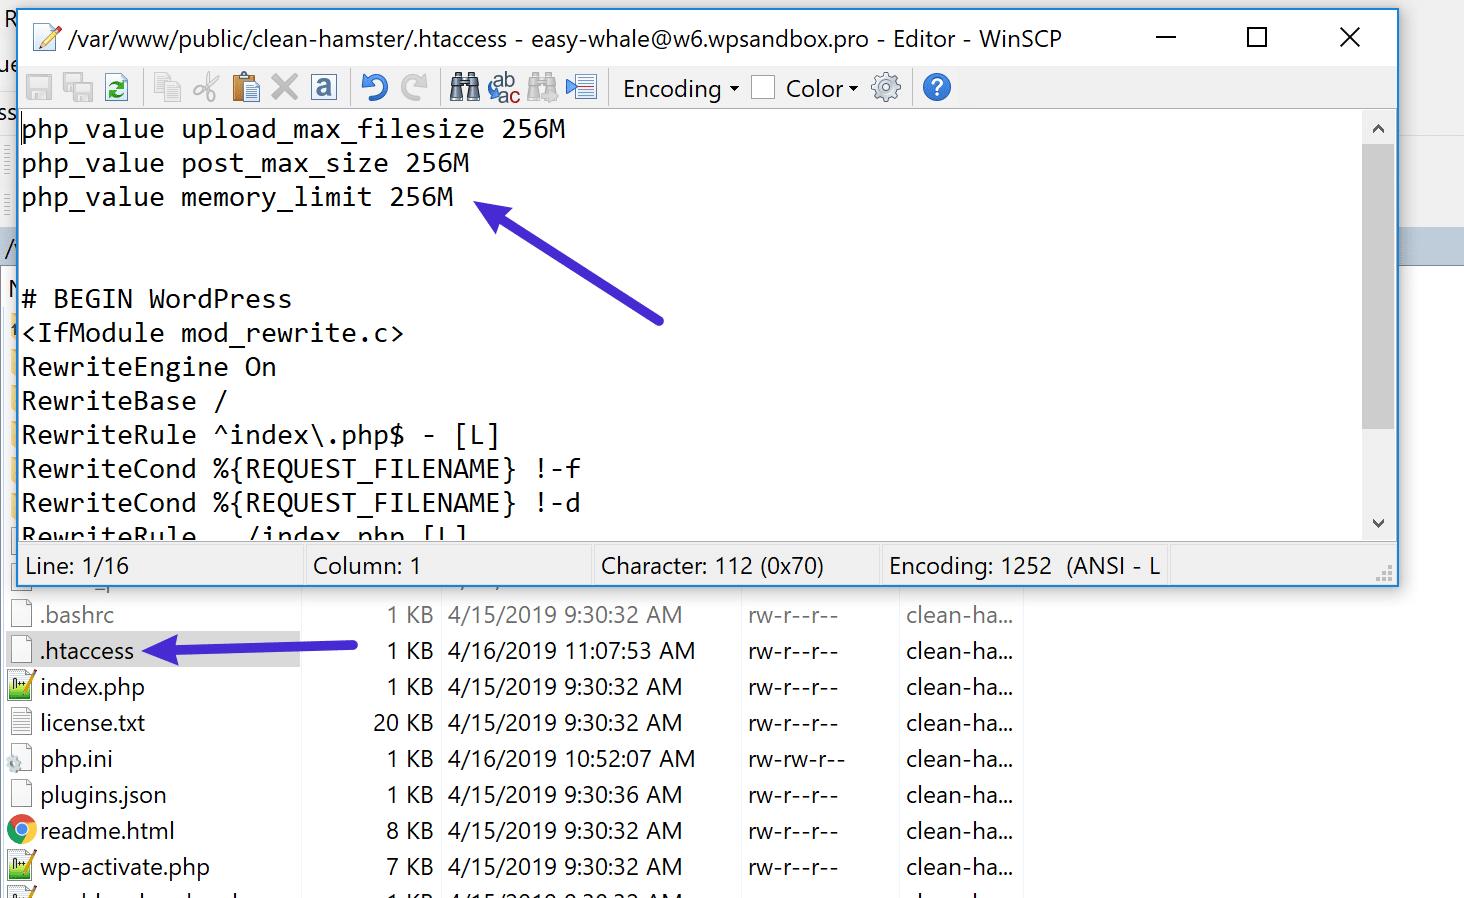 Sådan kontrolleres php.ini-filen via .htaccess